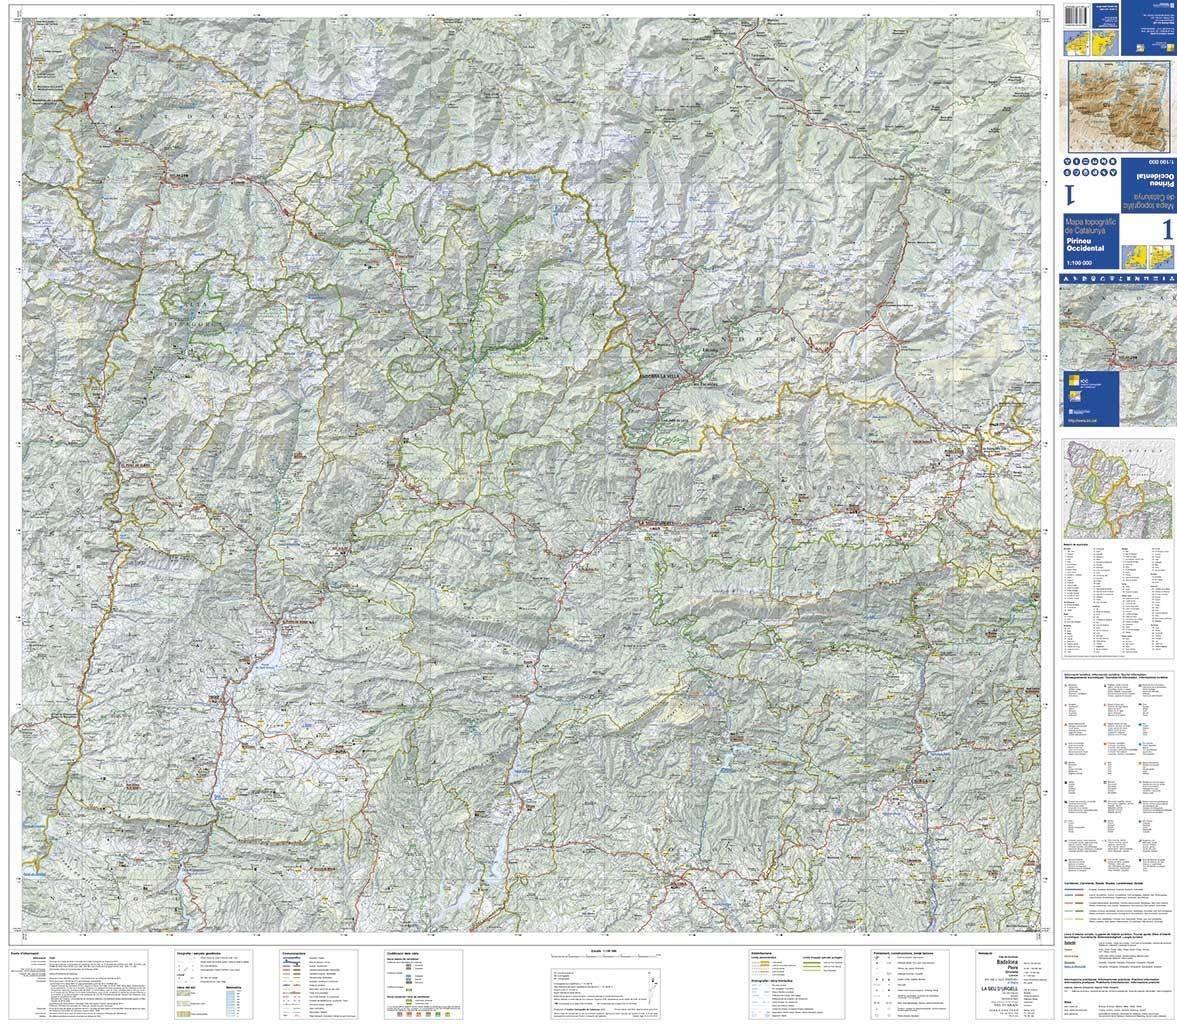 Mapa Topografic De Catalunya.Mapa Topografic De Catalunya 1 100 000 Pirineu Occidental 1